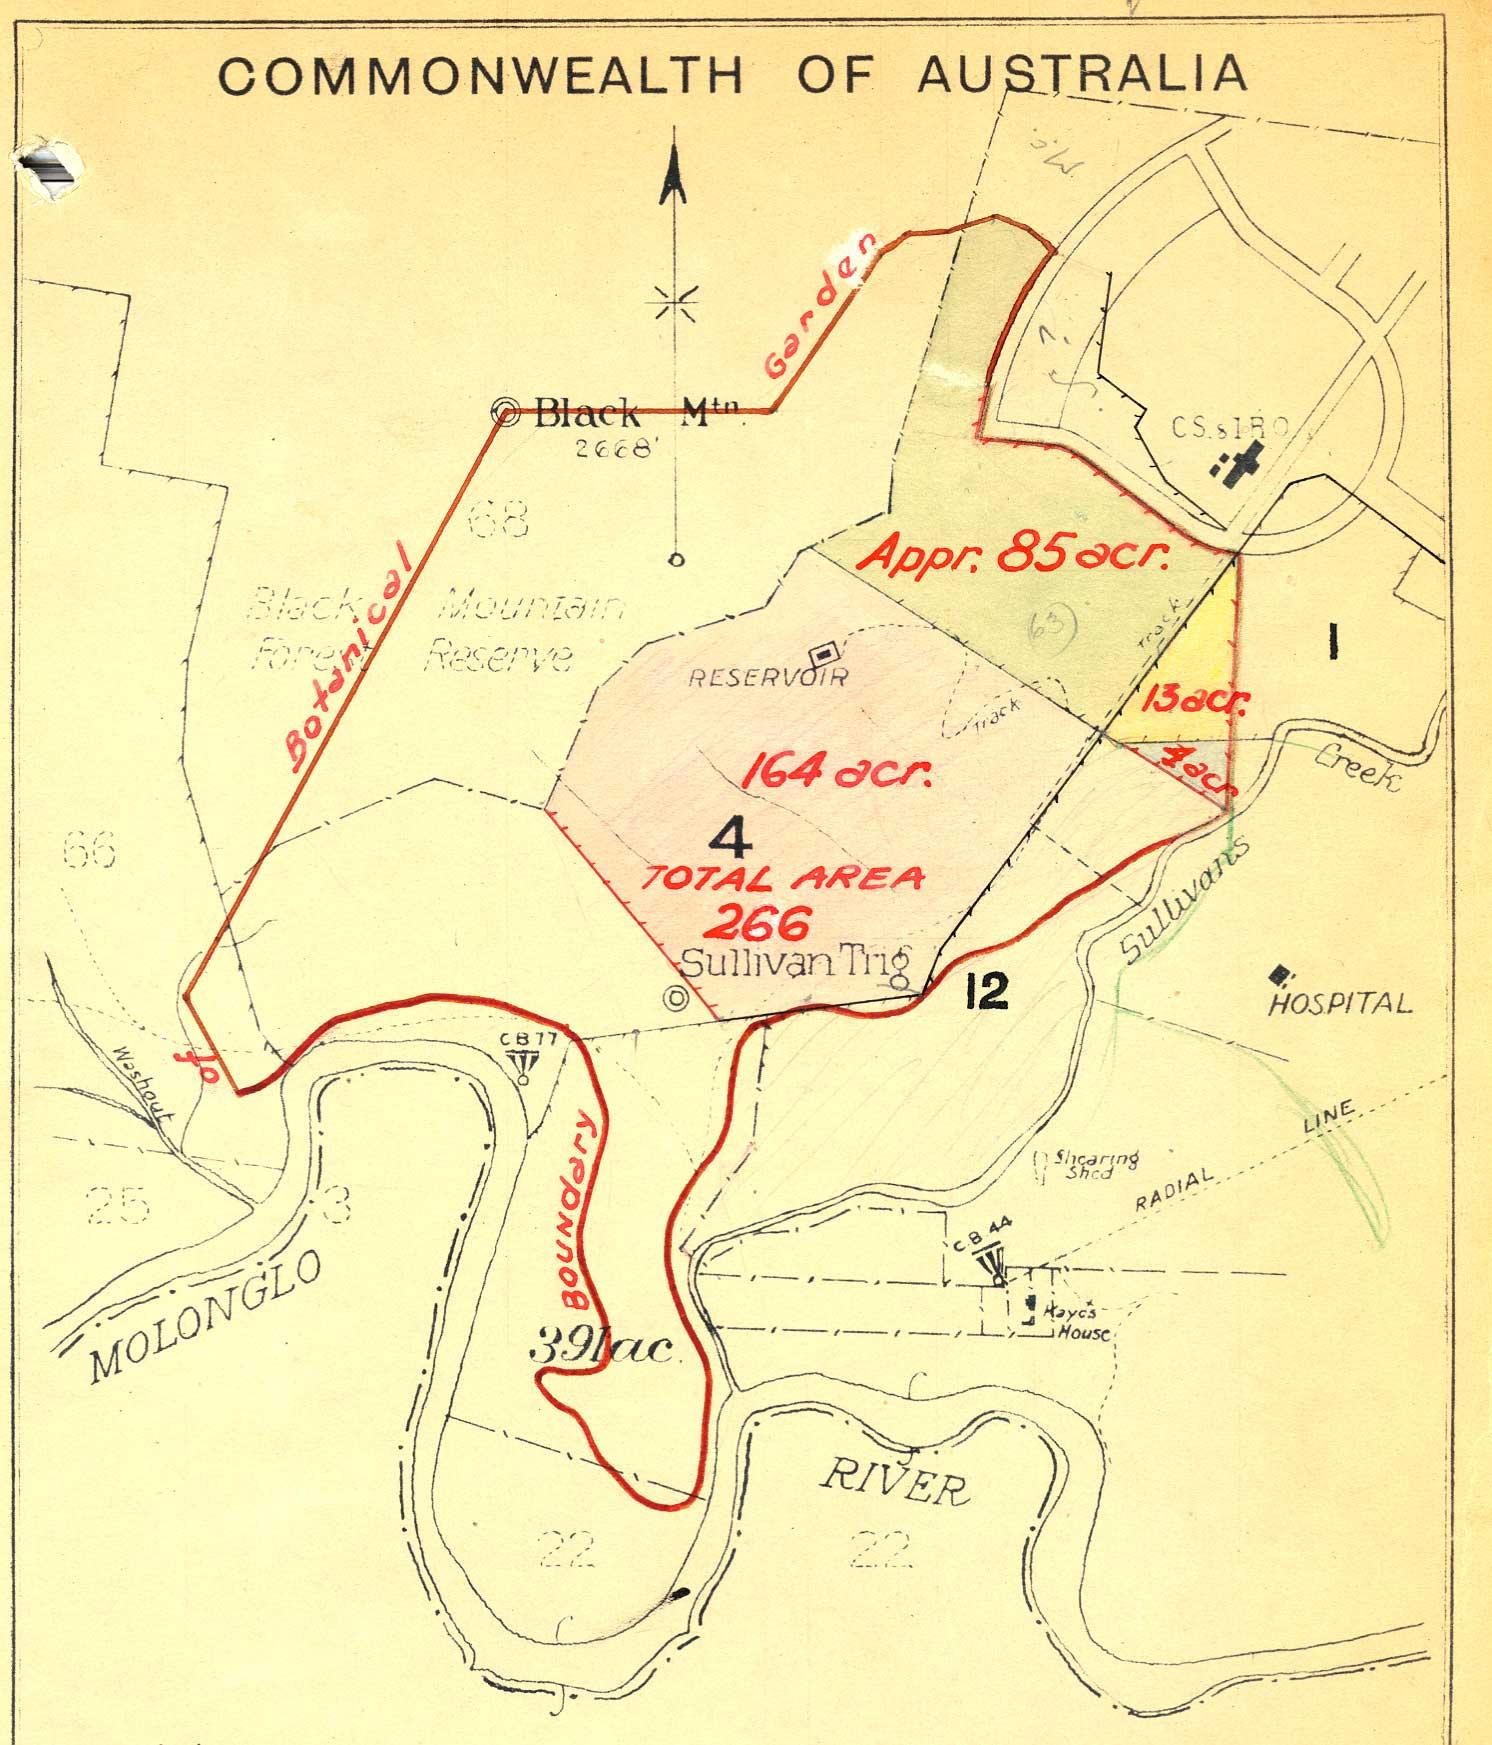 Australia Canberra Map.Maps Of The Australian National Botanic Gardens